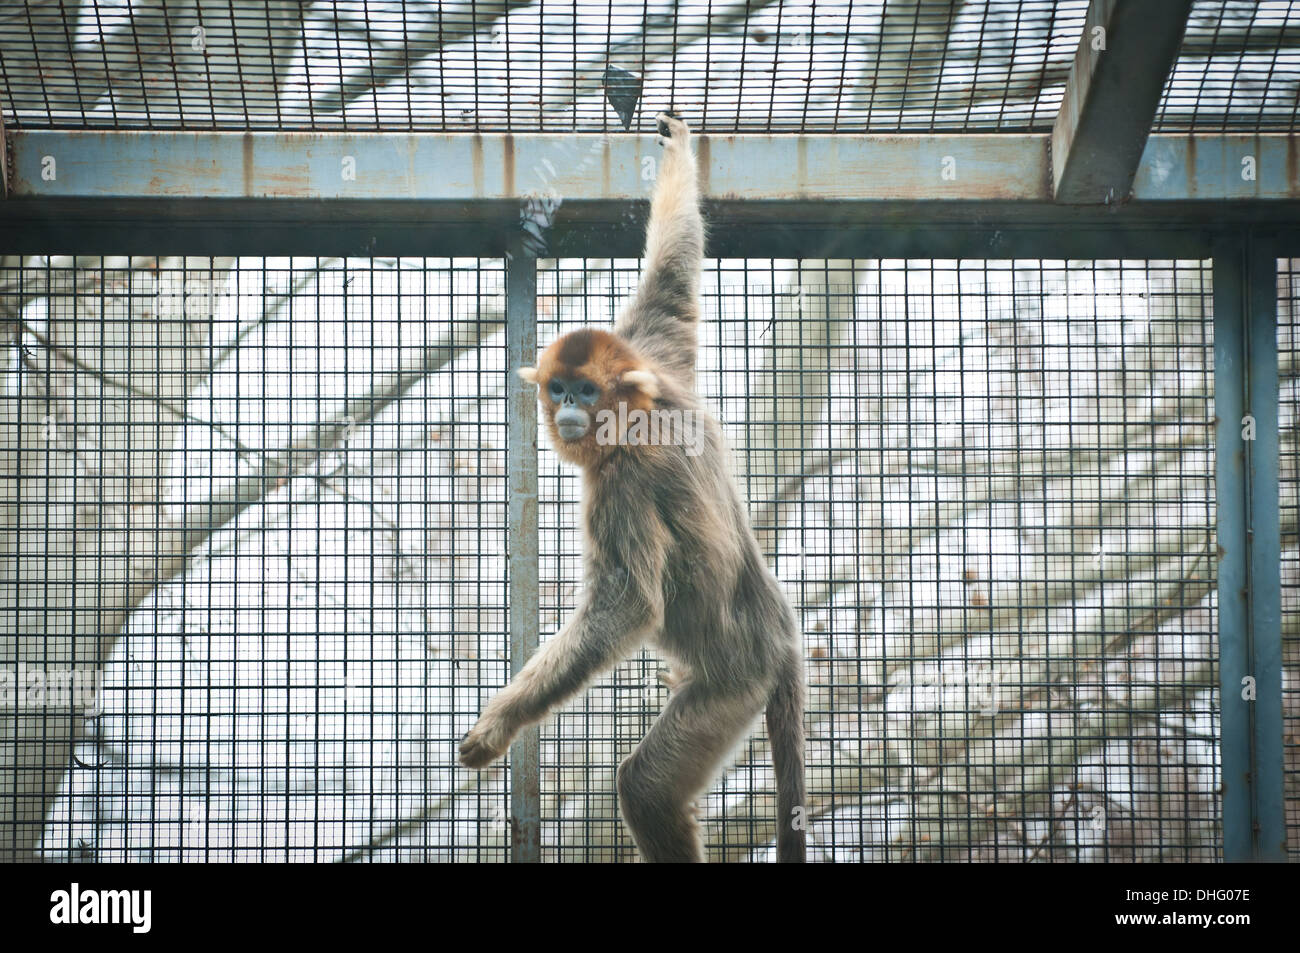 Golden snub-nosed monkey (Rhinopithecus roxellana or Pygathrix roxellana) Beijing Zoo in Xicheng District, Beijing, China - Stock Image